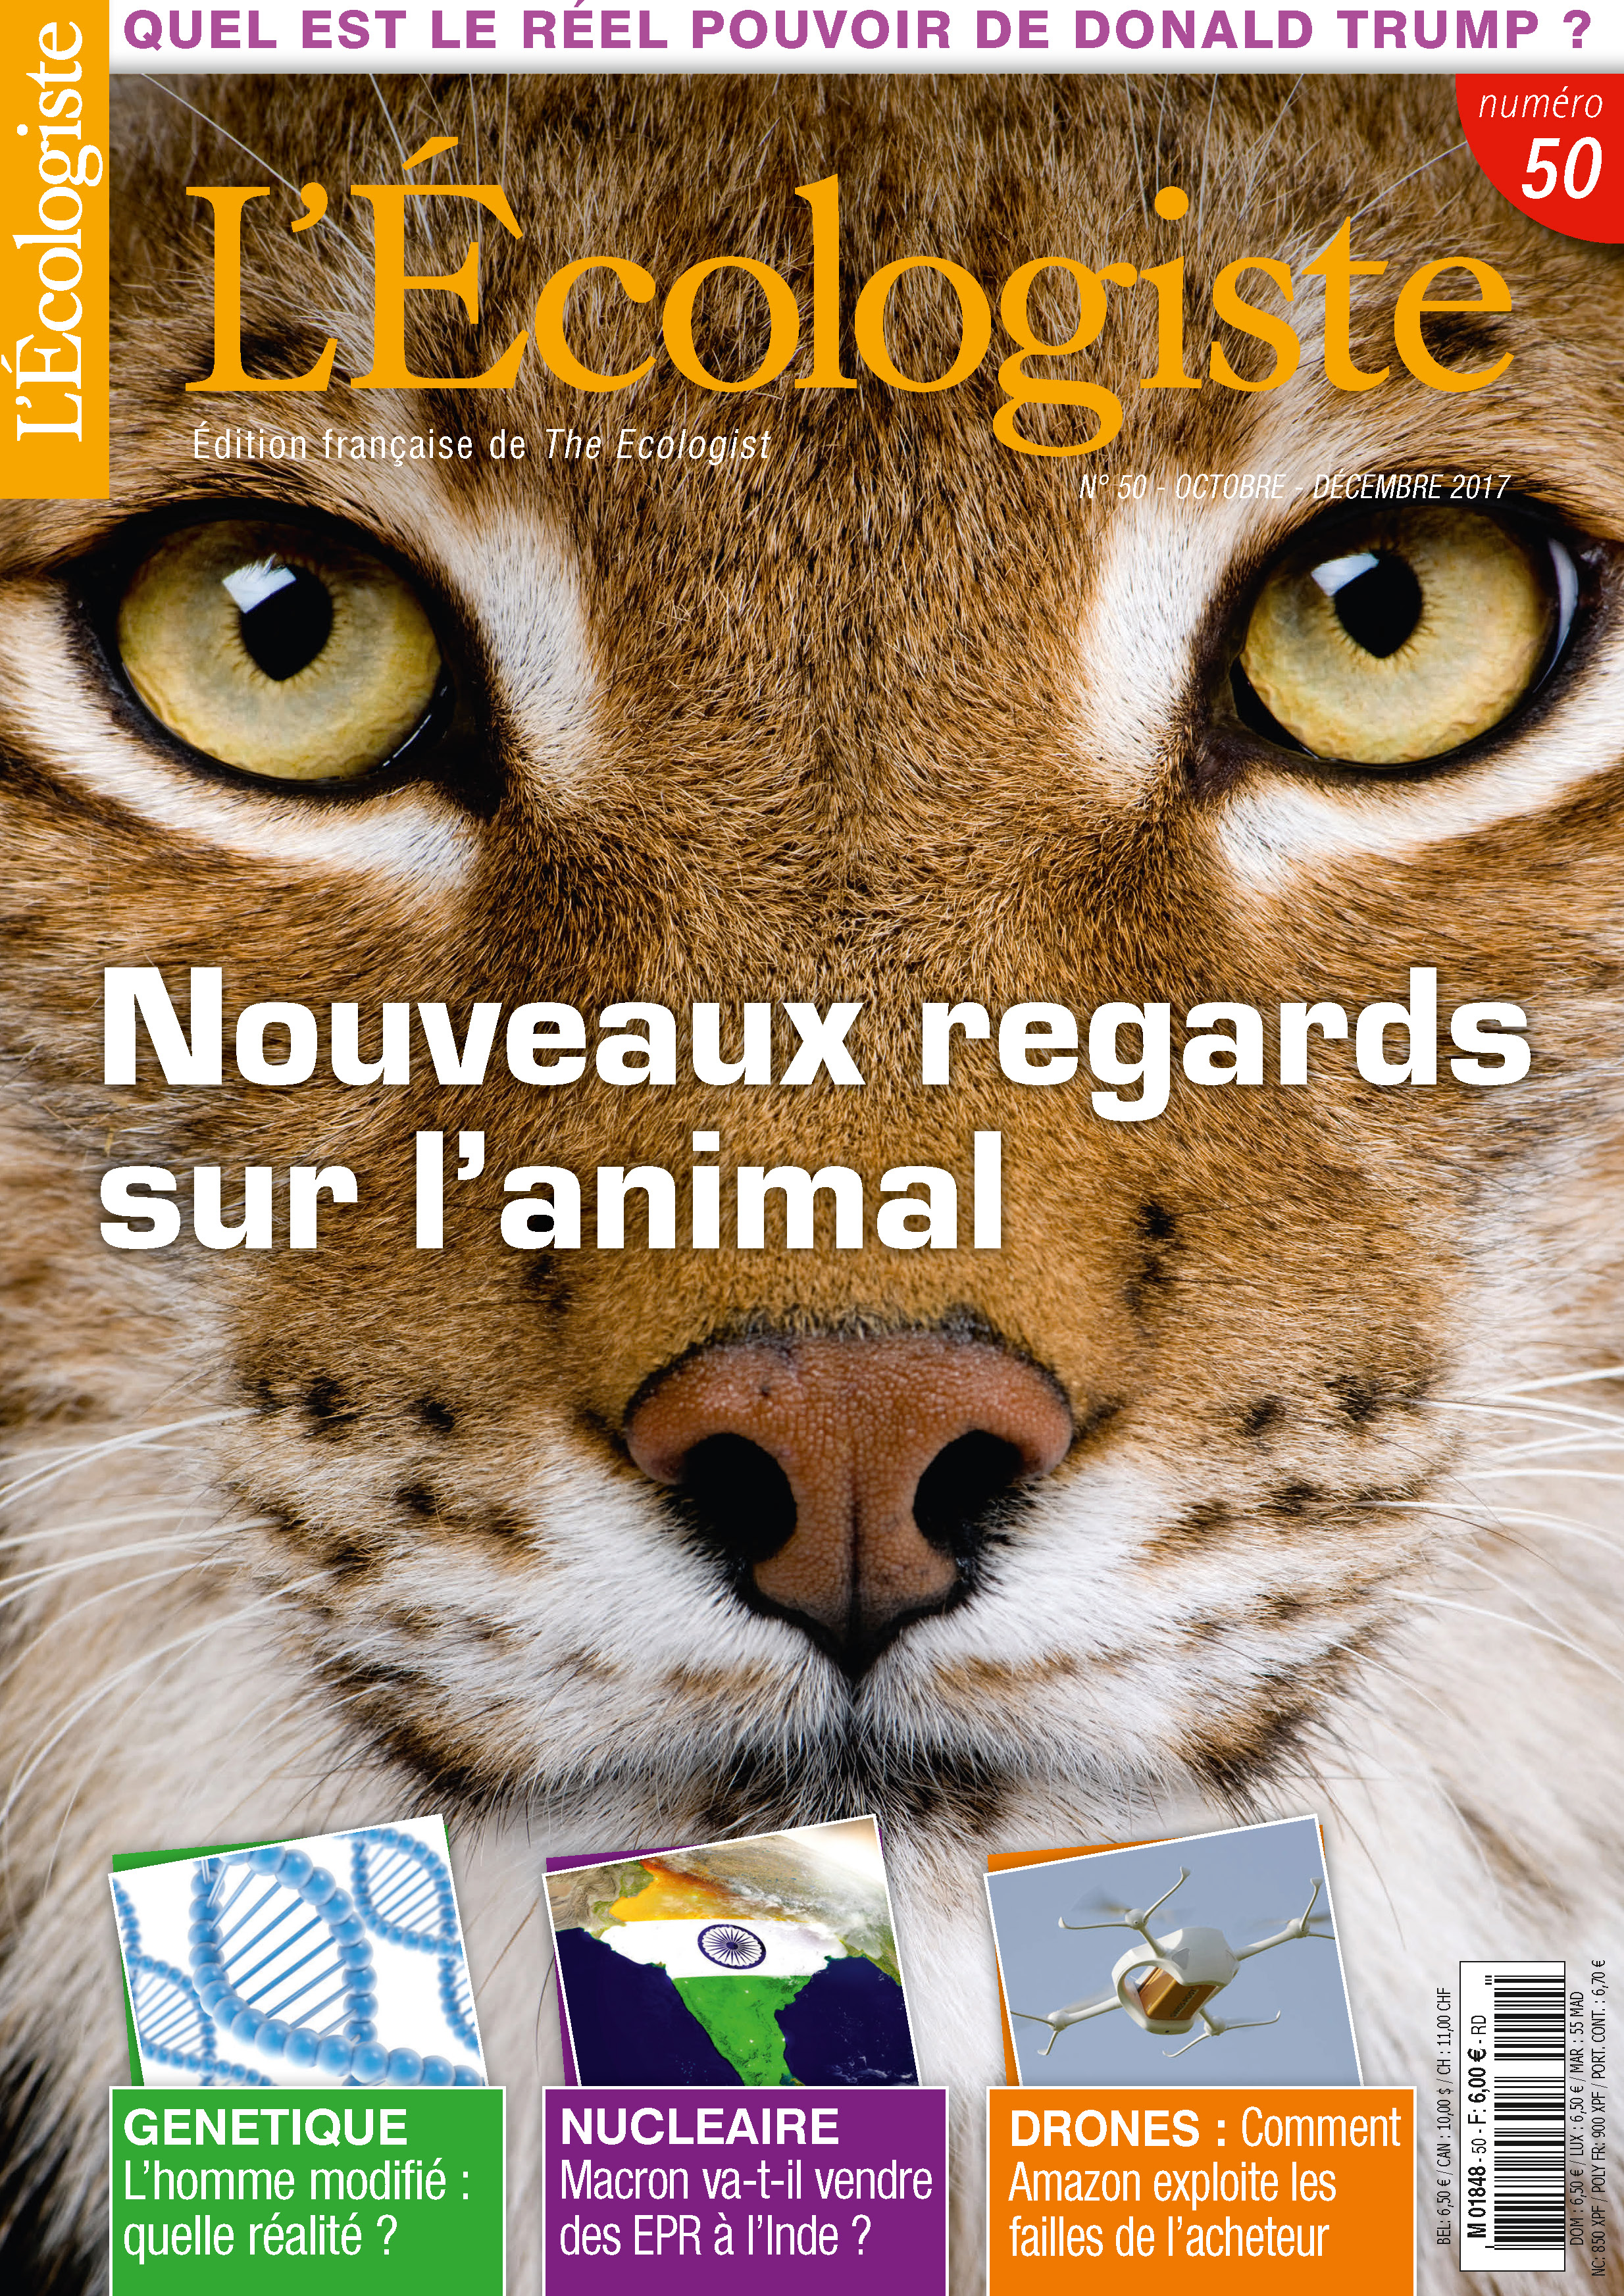 L_Ecologiste_50_hautedef